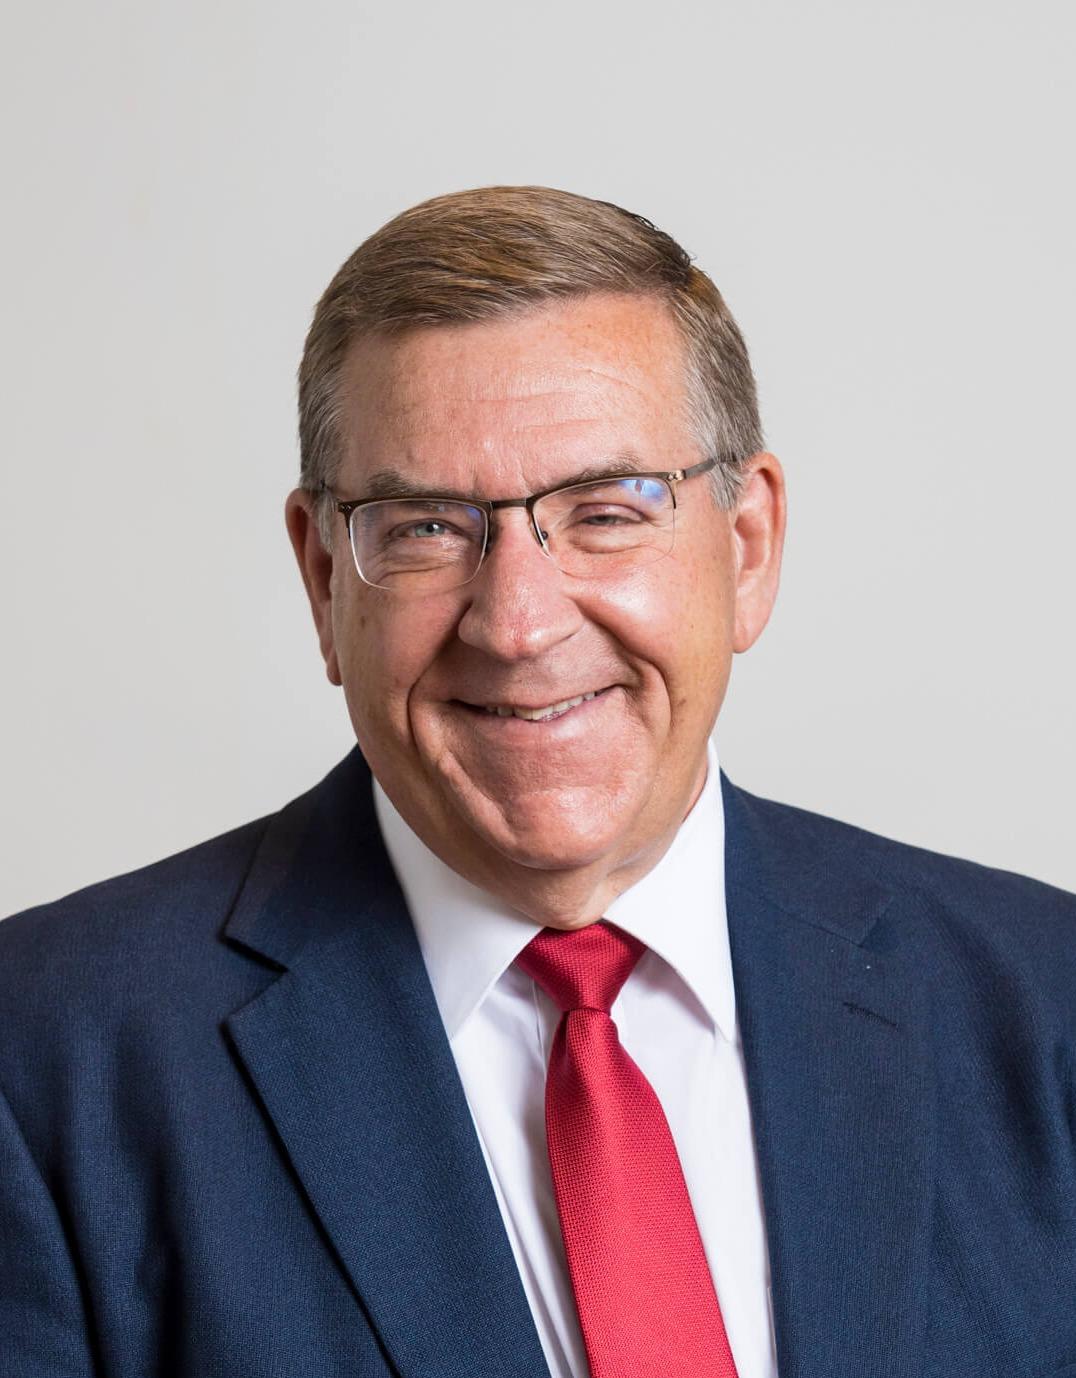 Marv Soldner Headshot 2020